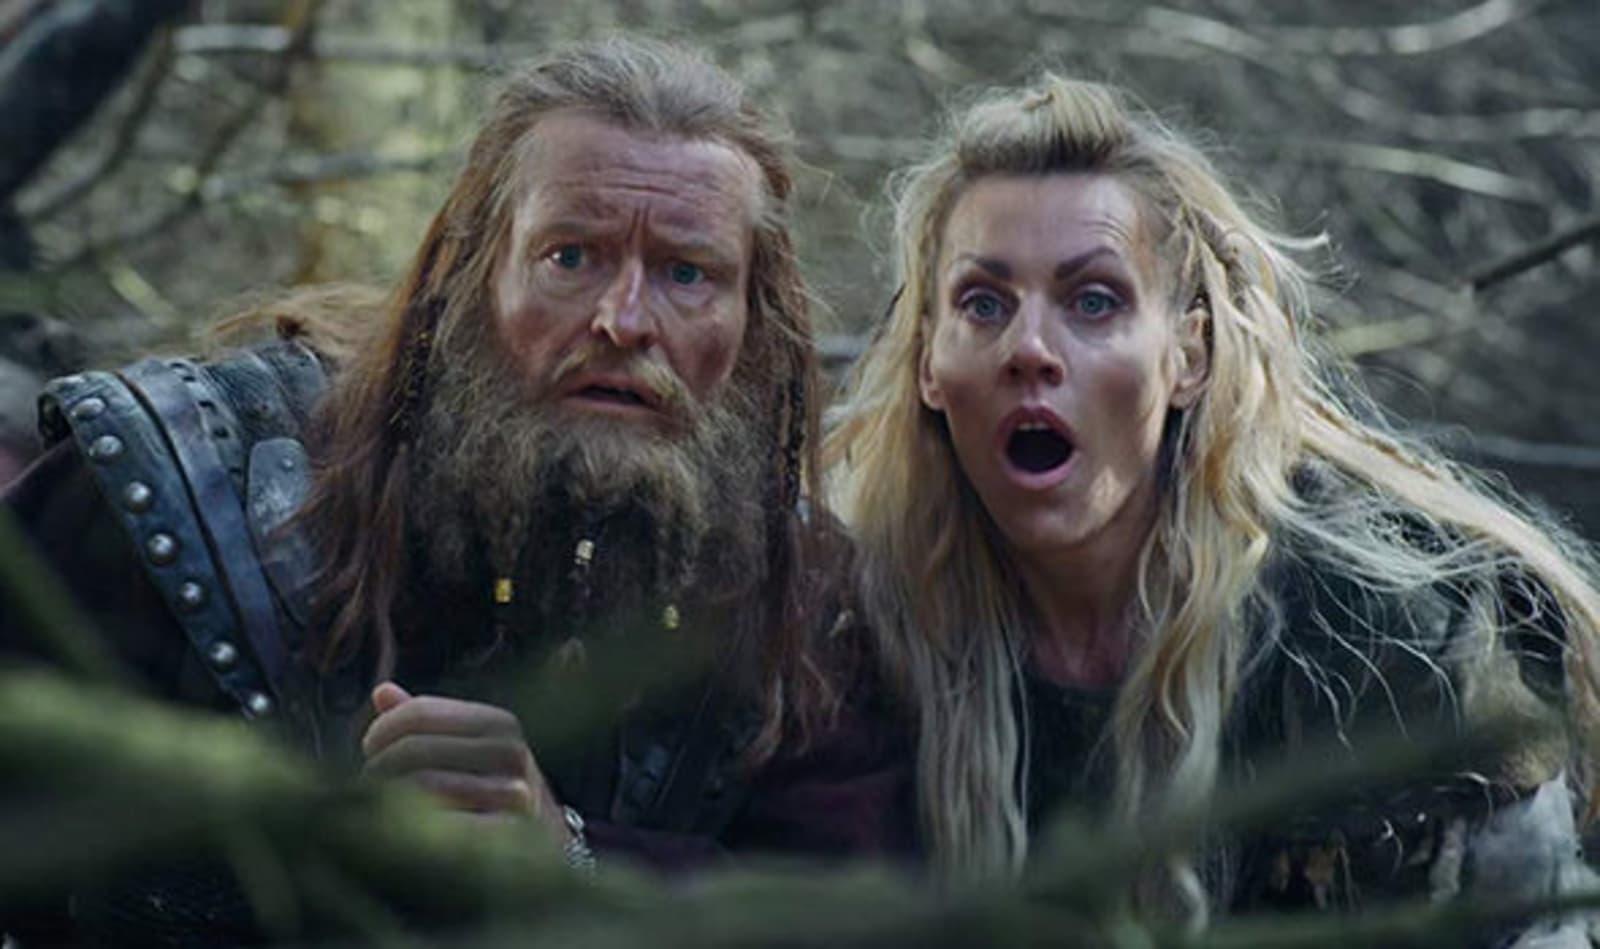 'Norsemen' producer gamed Netflix's algorithm with Facebook ads